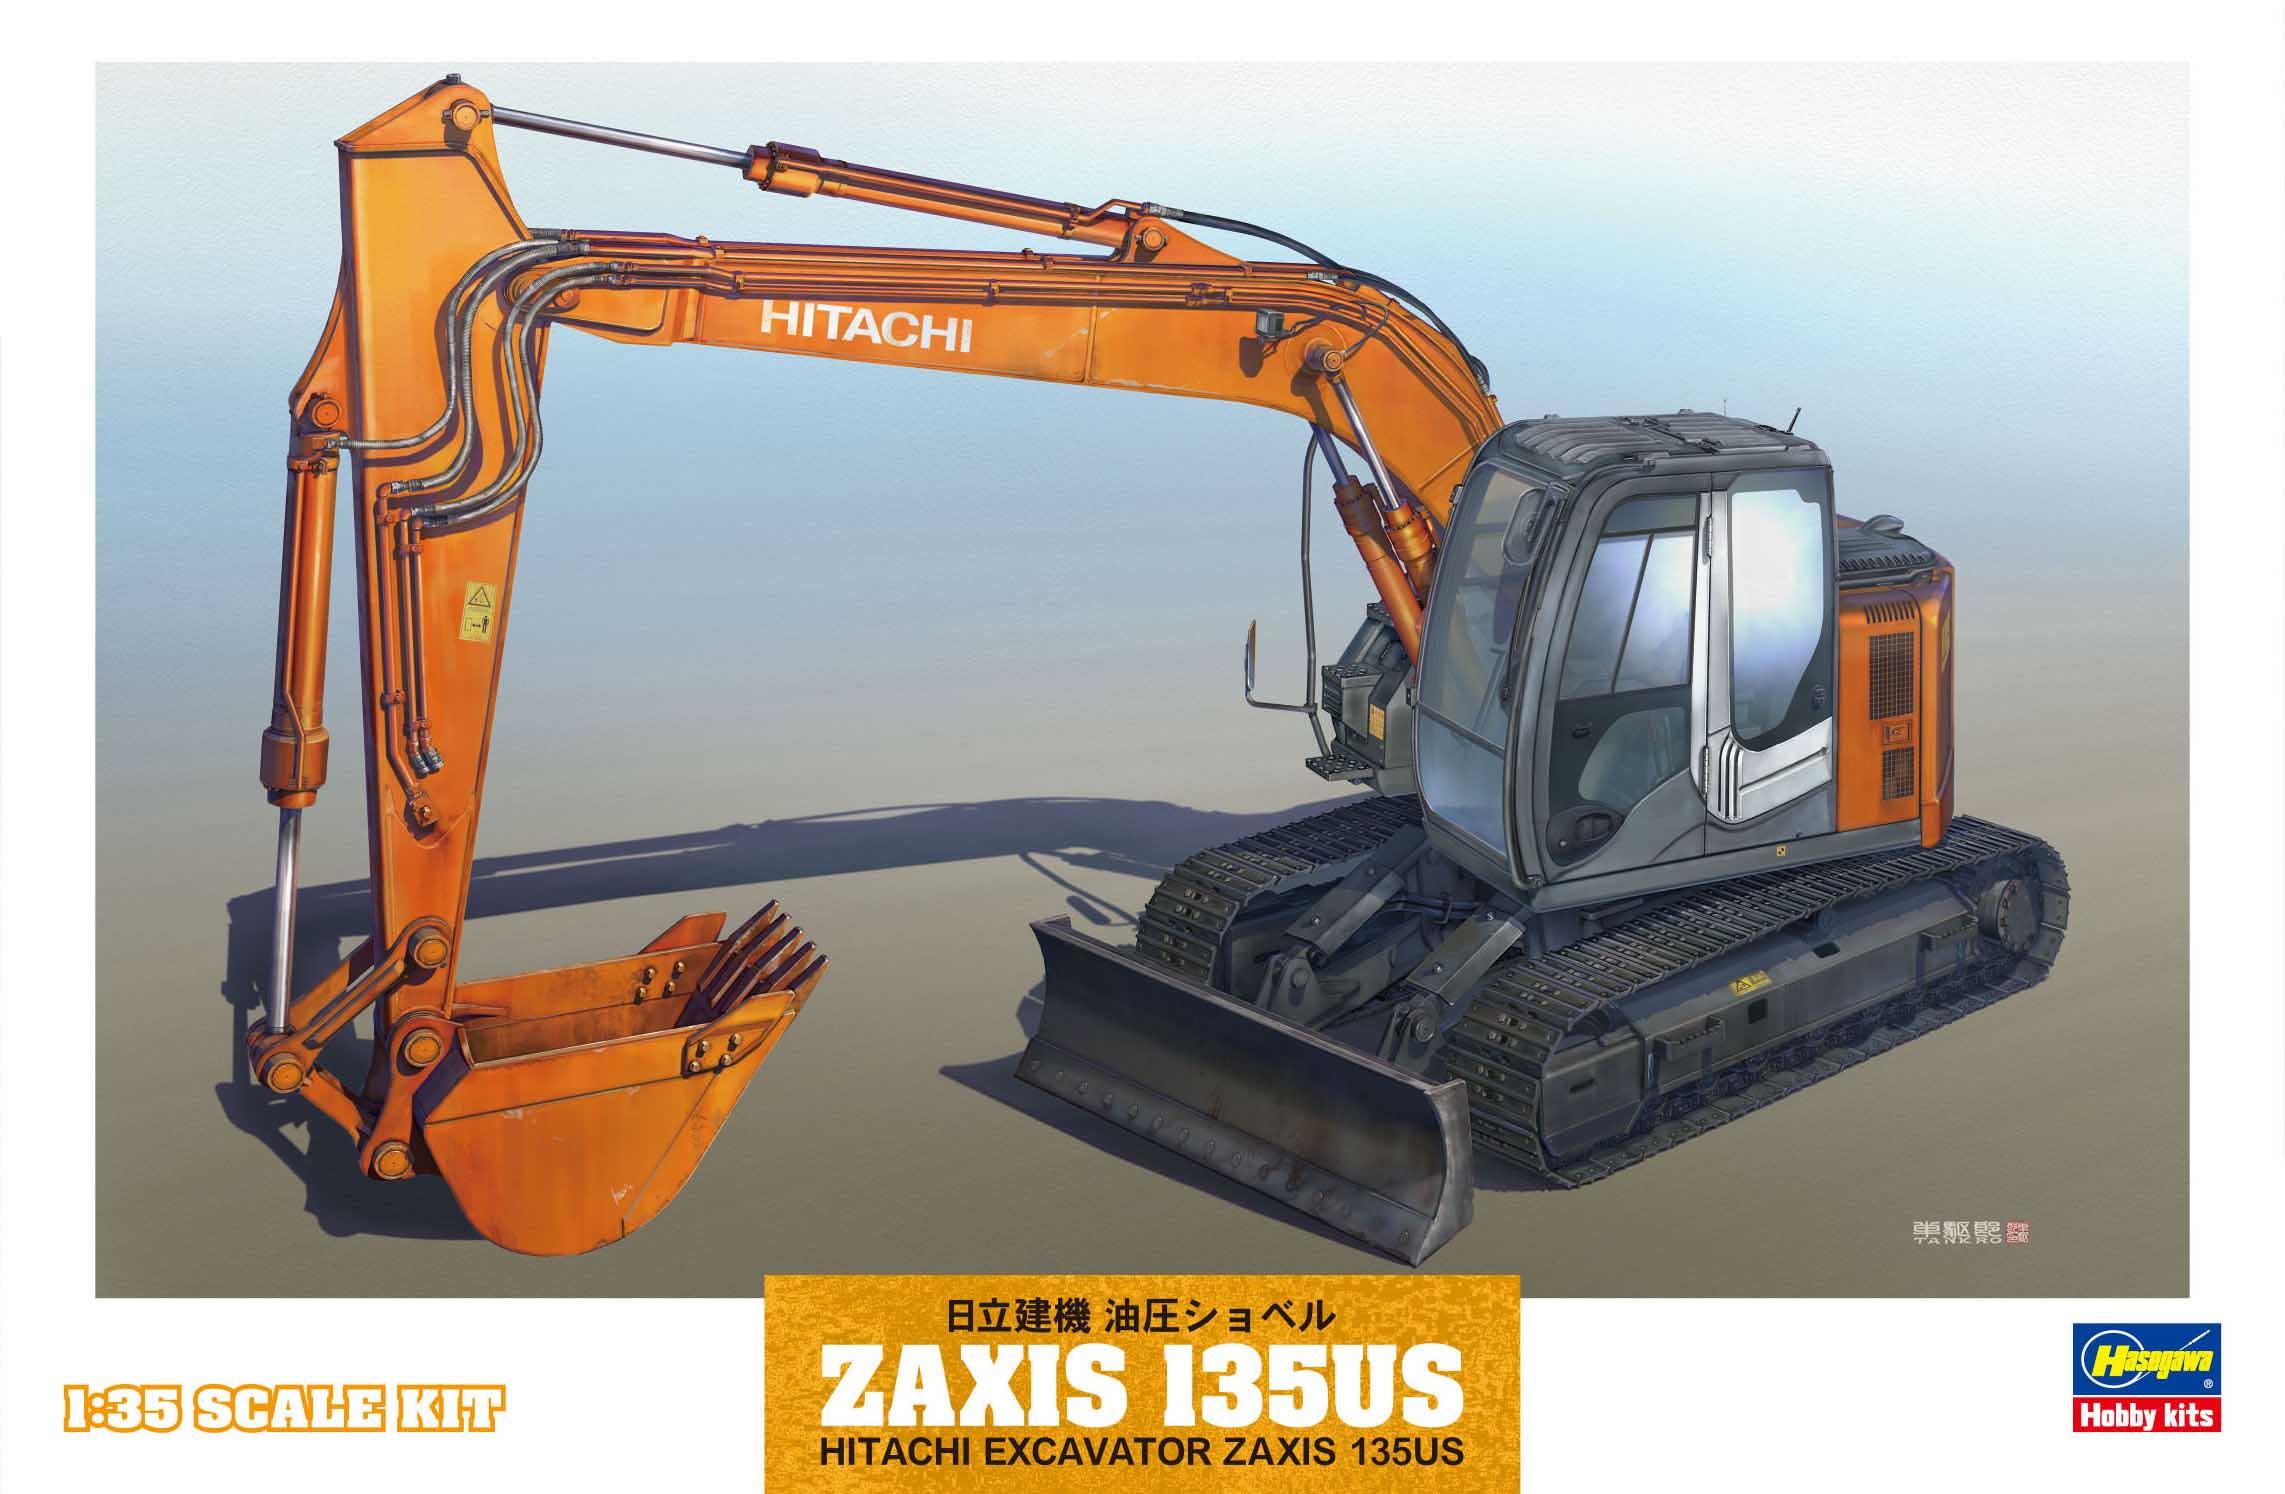 Hasegawa 1/35 Hitachi Excavator Zaxis 135Us